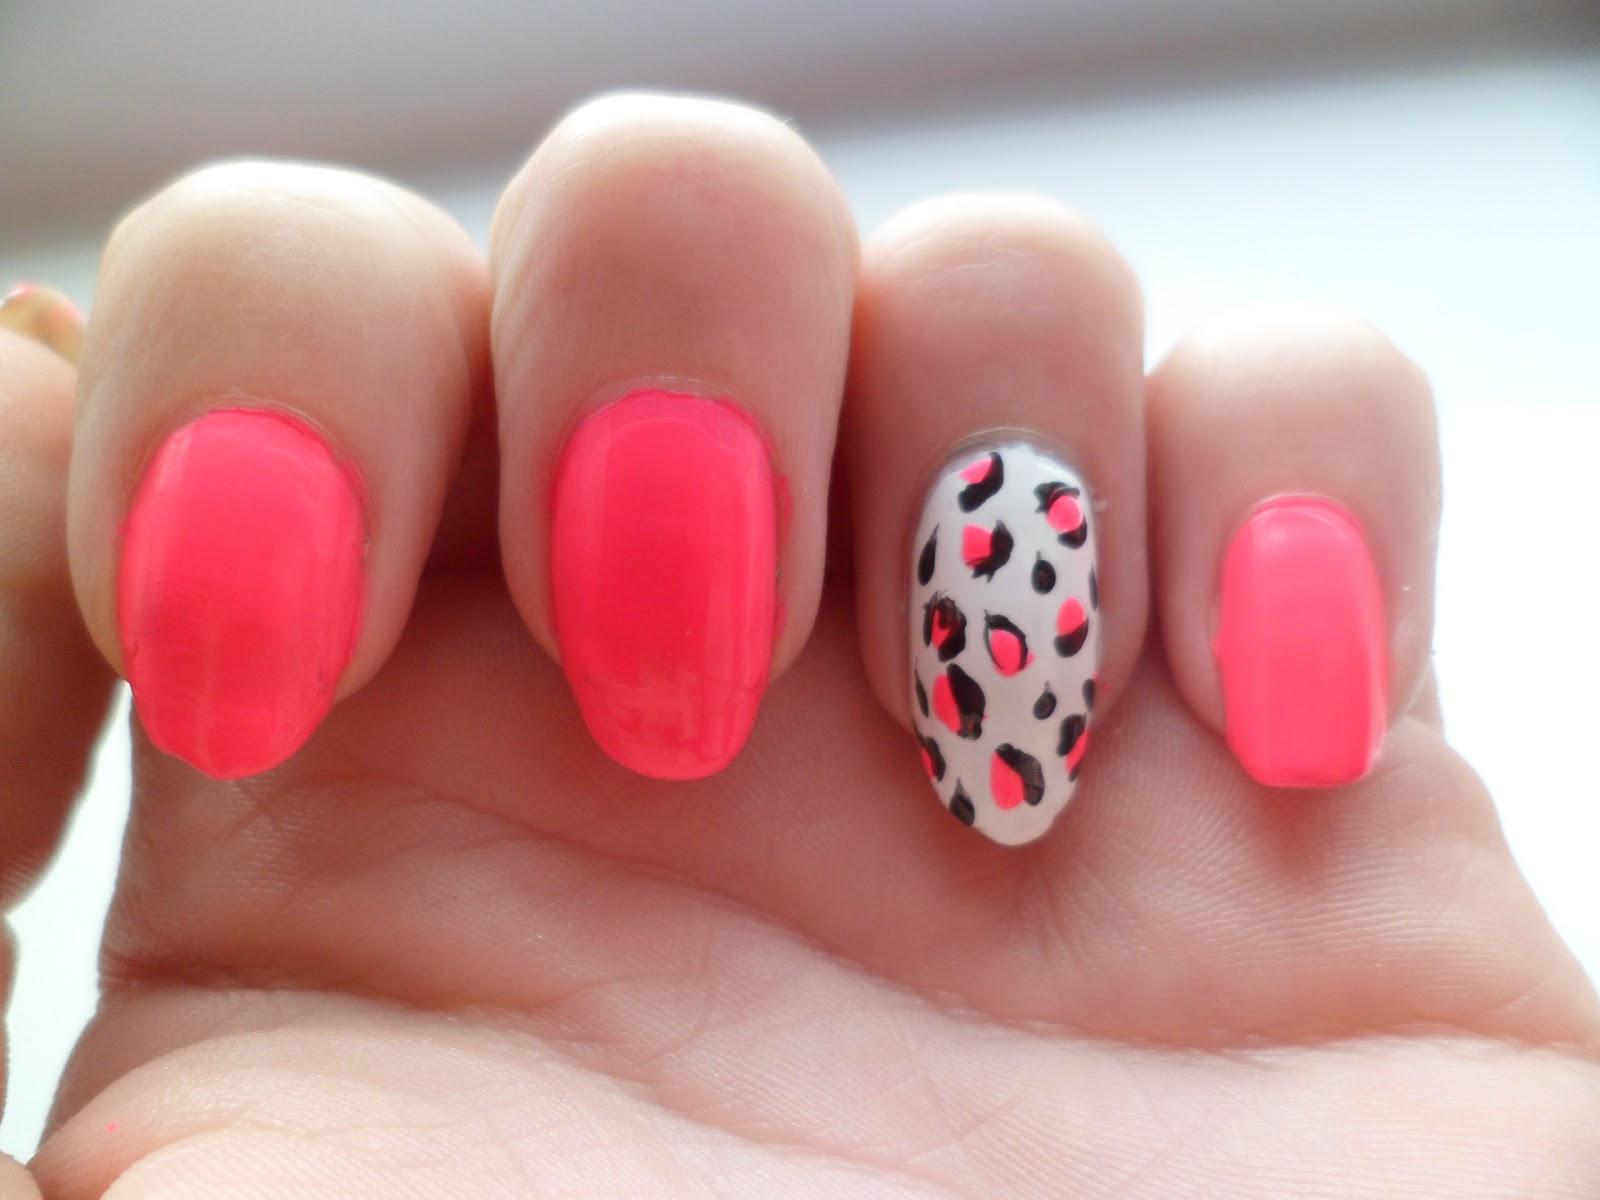 Jenna Suth: Neon Pink Animal Print Nail Art